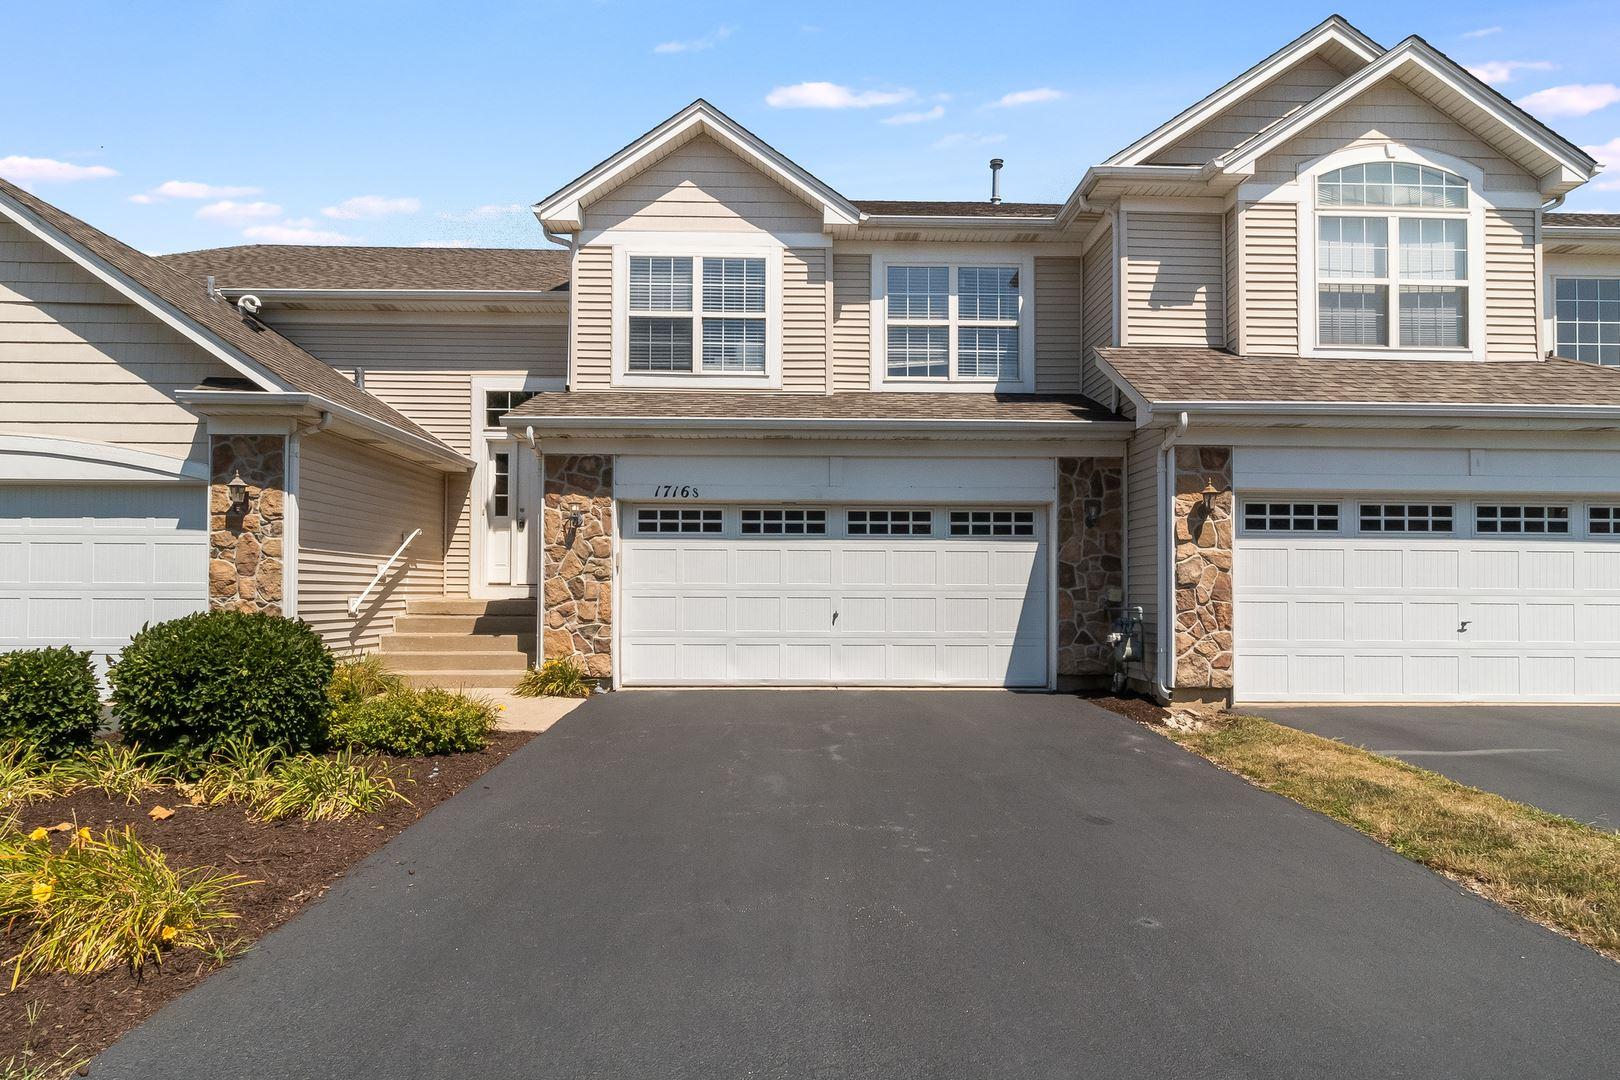 Photo of 1716 Fieldstone Drive S, Shorewood, IL 60404 (MLS # 10861112)